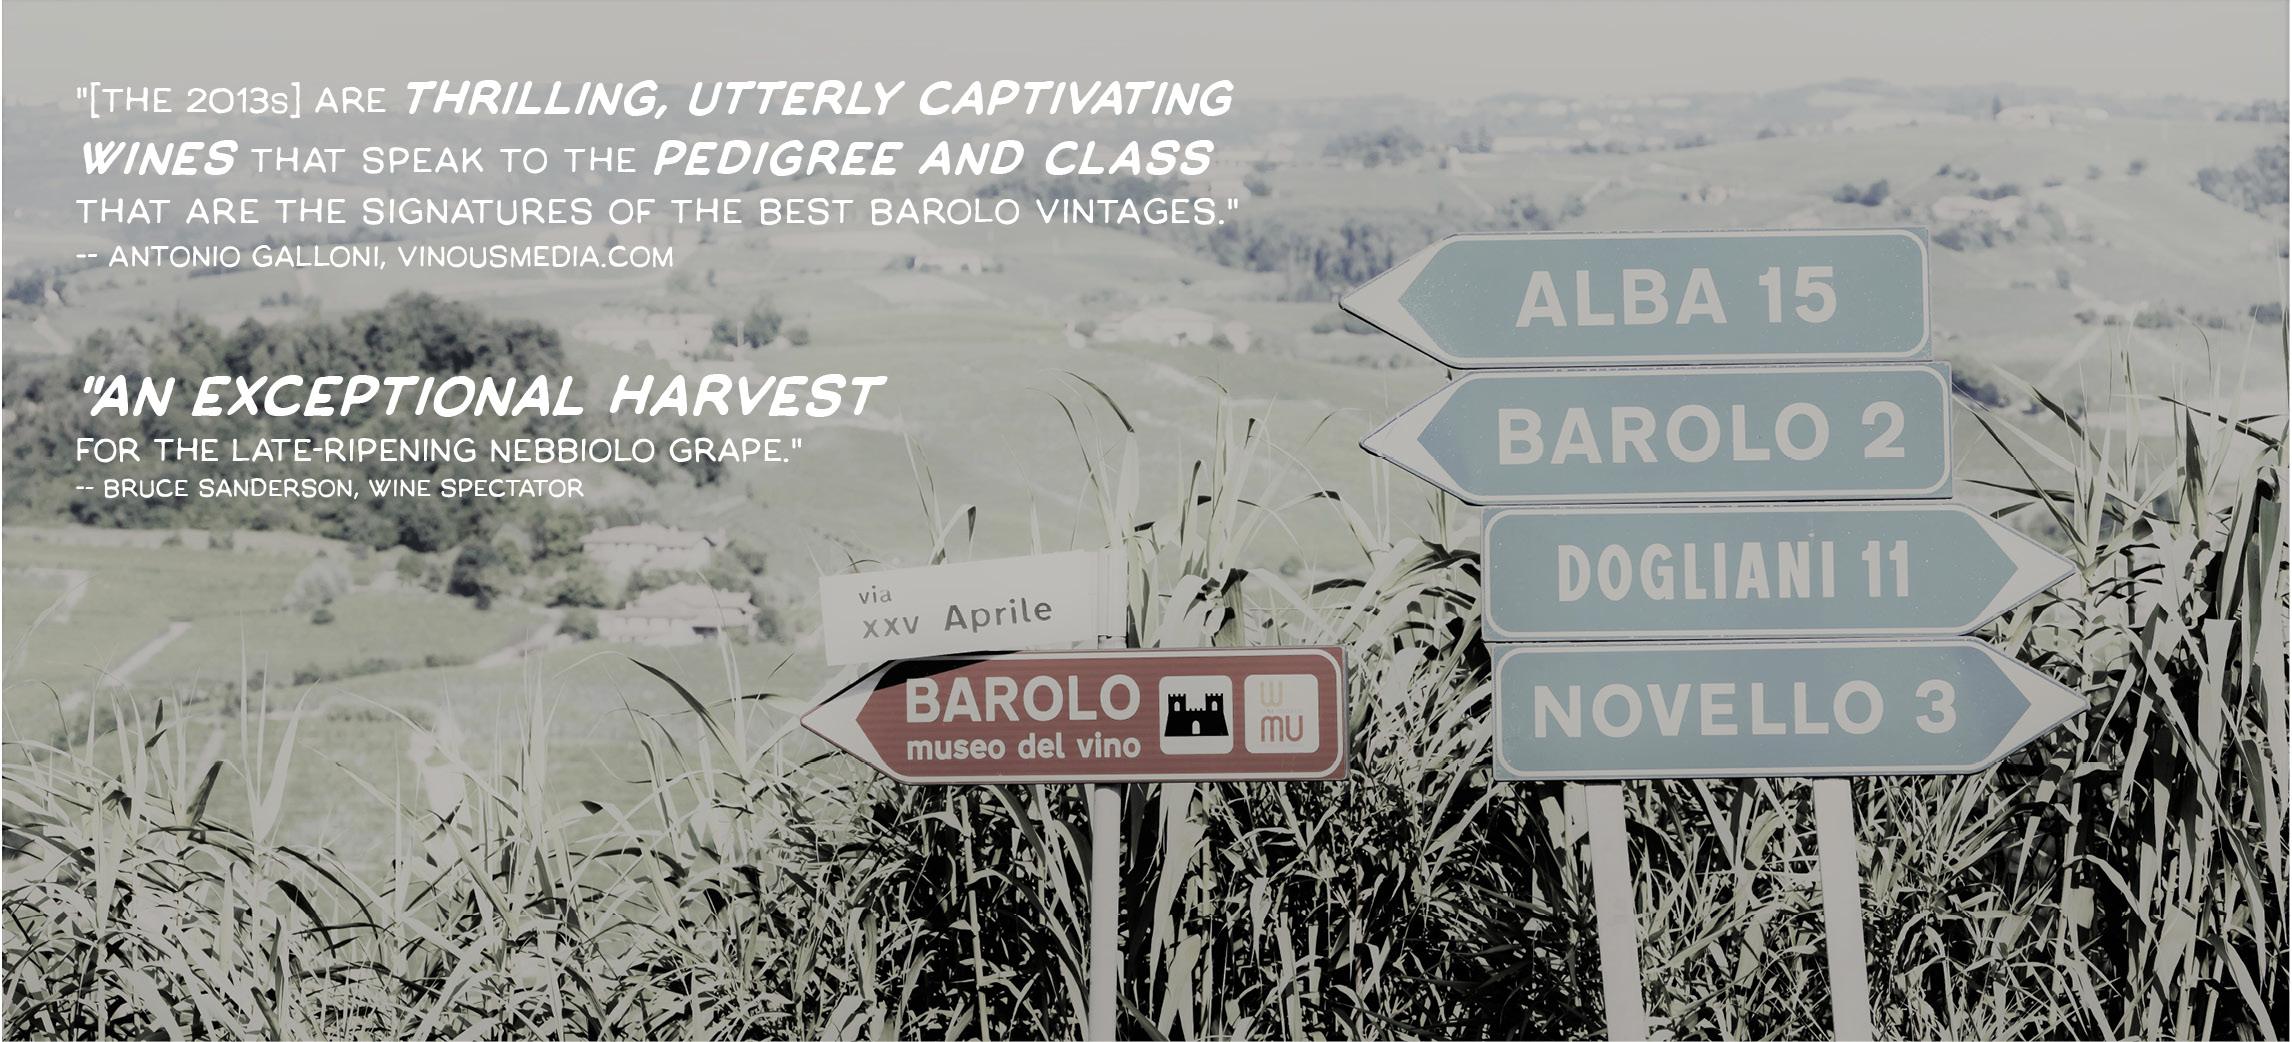 Page Splash Title - Barolo 2013 - Massanois